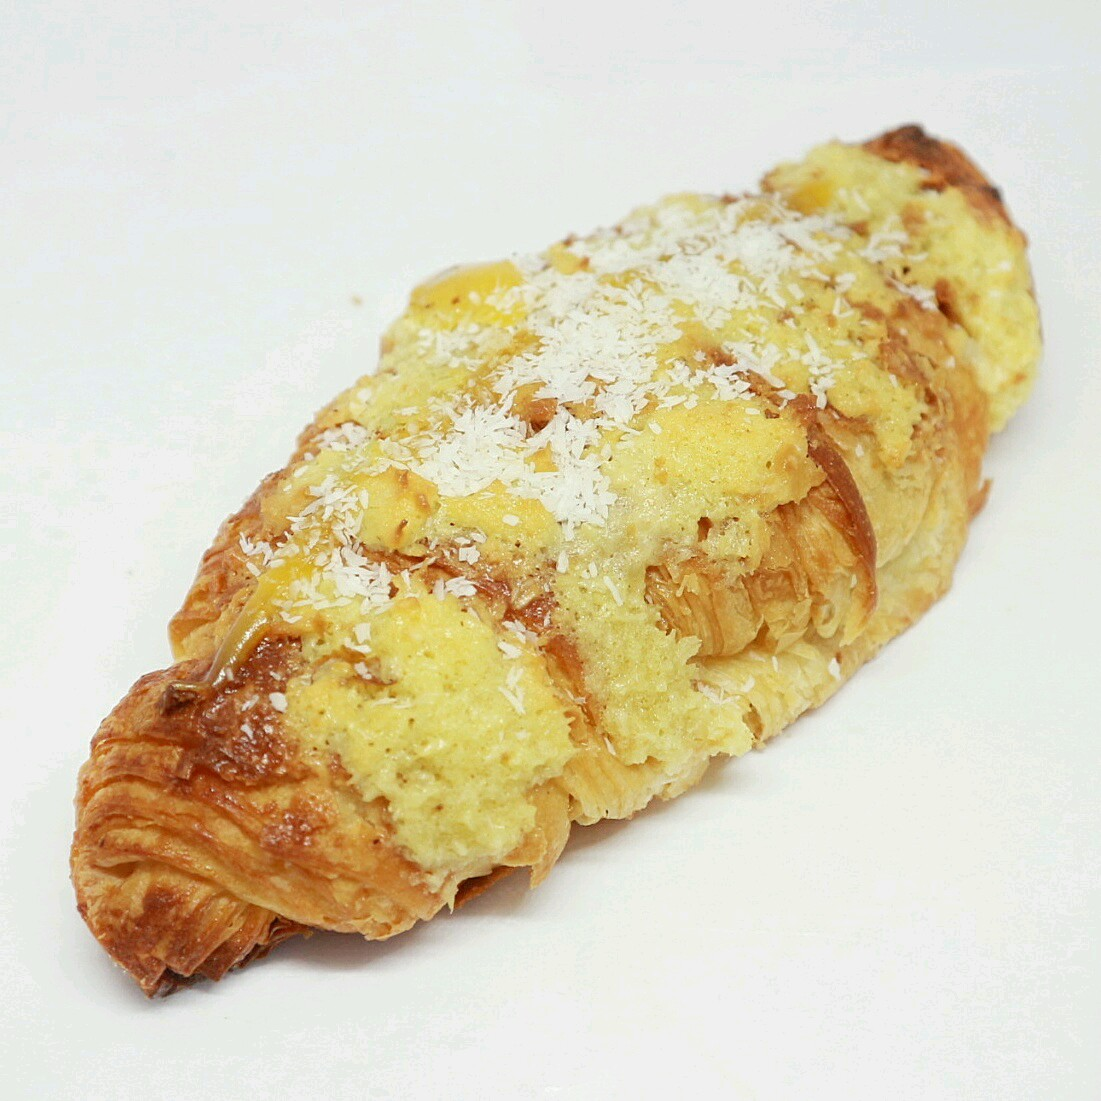 Coconut Srikaya Croissant - Rp. 20.000,-